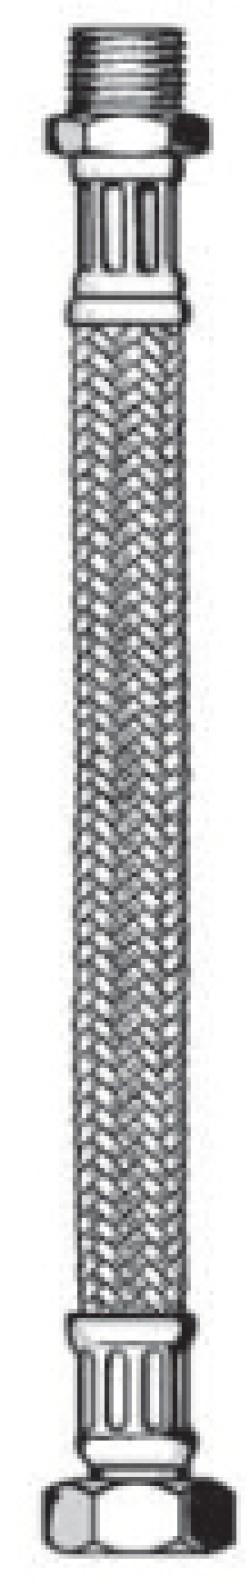 МЕ 5615.1104.30 Meiflex Dn13, 1/2 BPx1/2 HP, 300mm